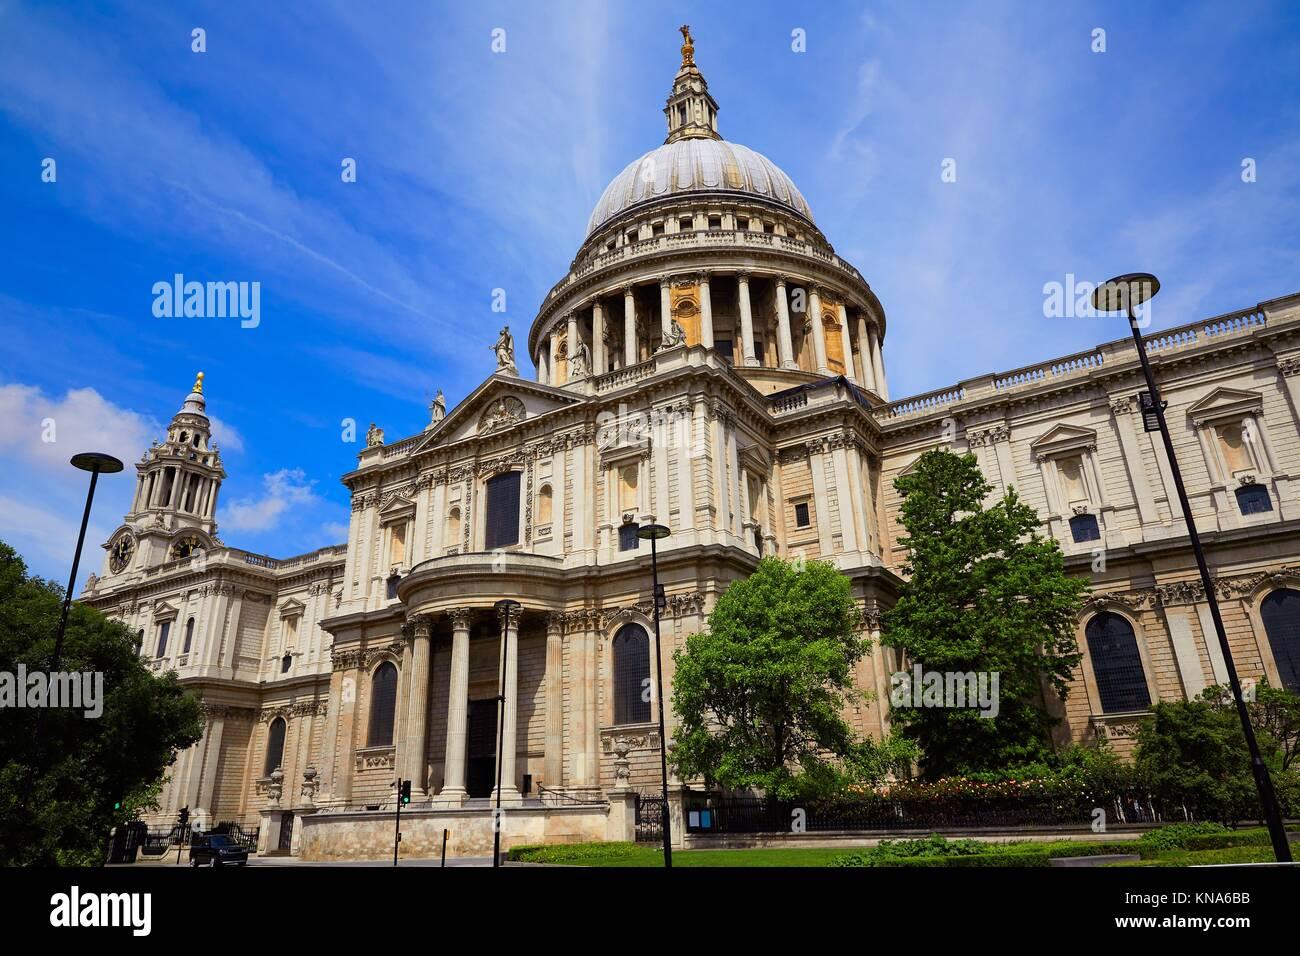 London St Paul Pauls Kathedrale Fassade in England. Stockfoto